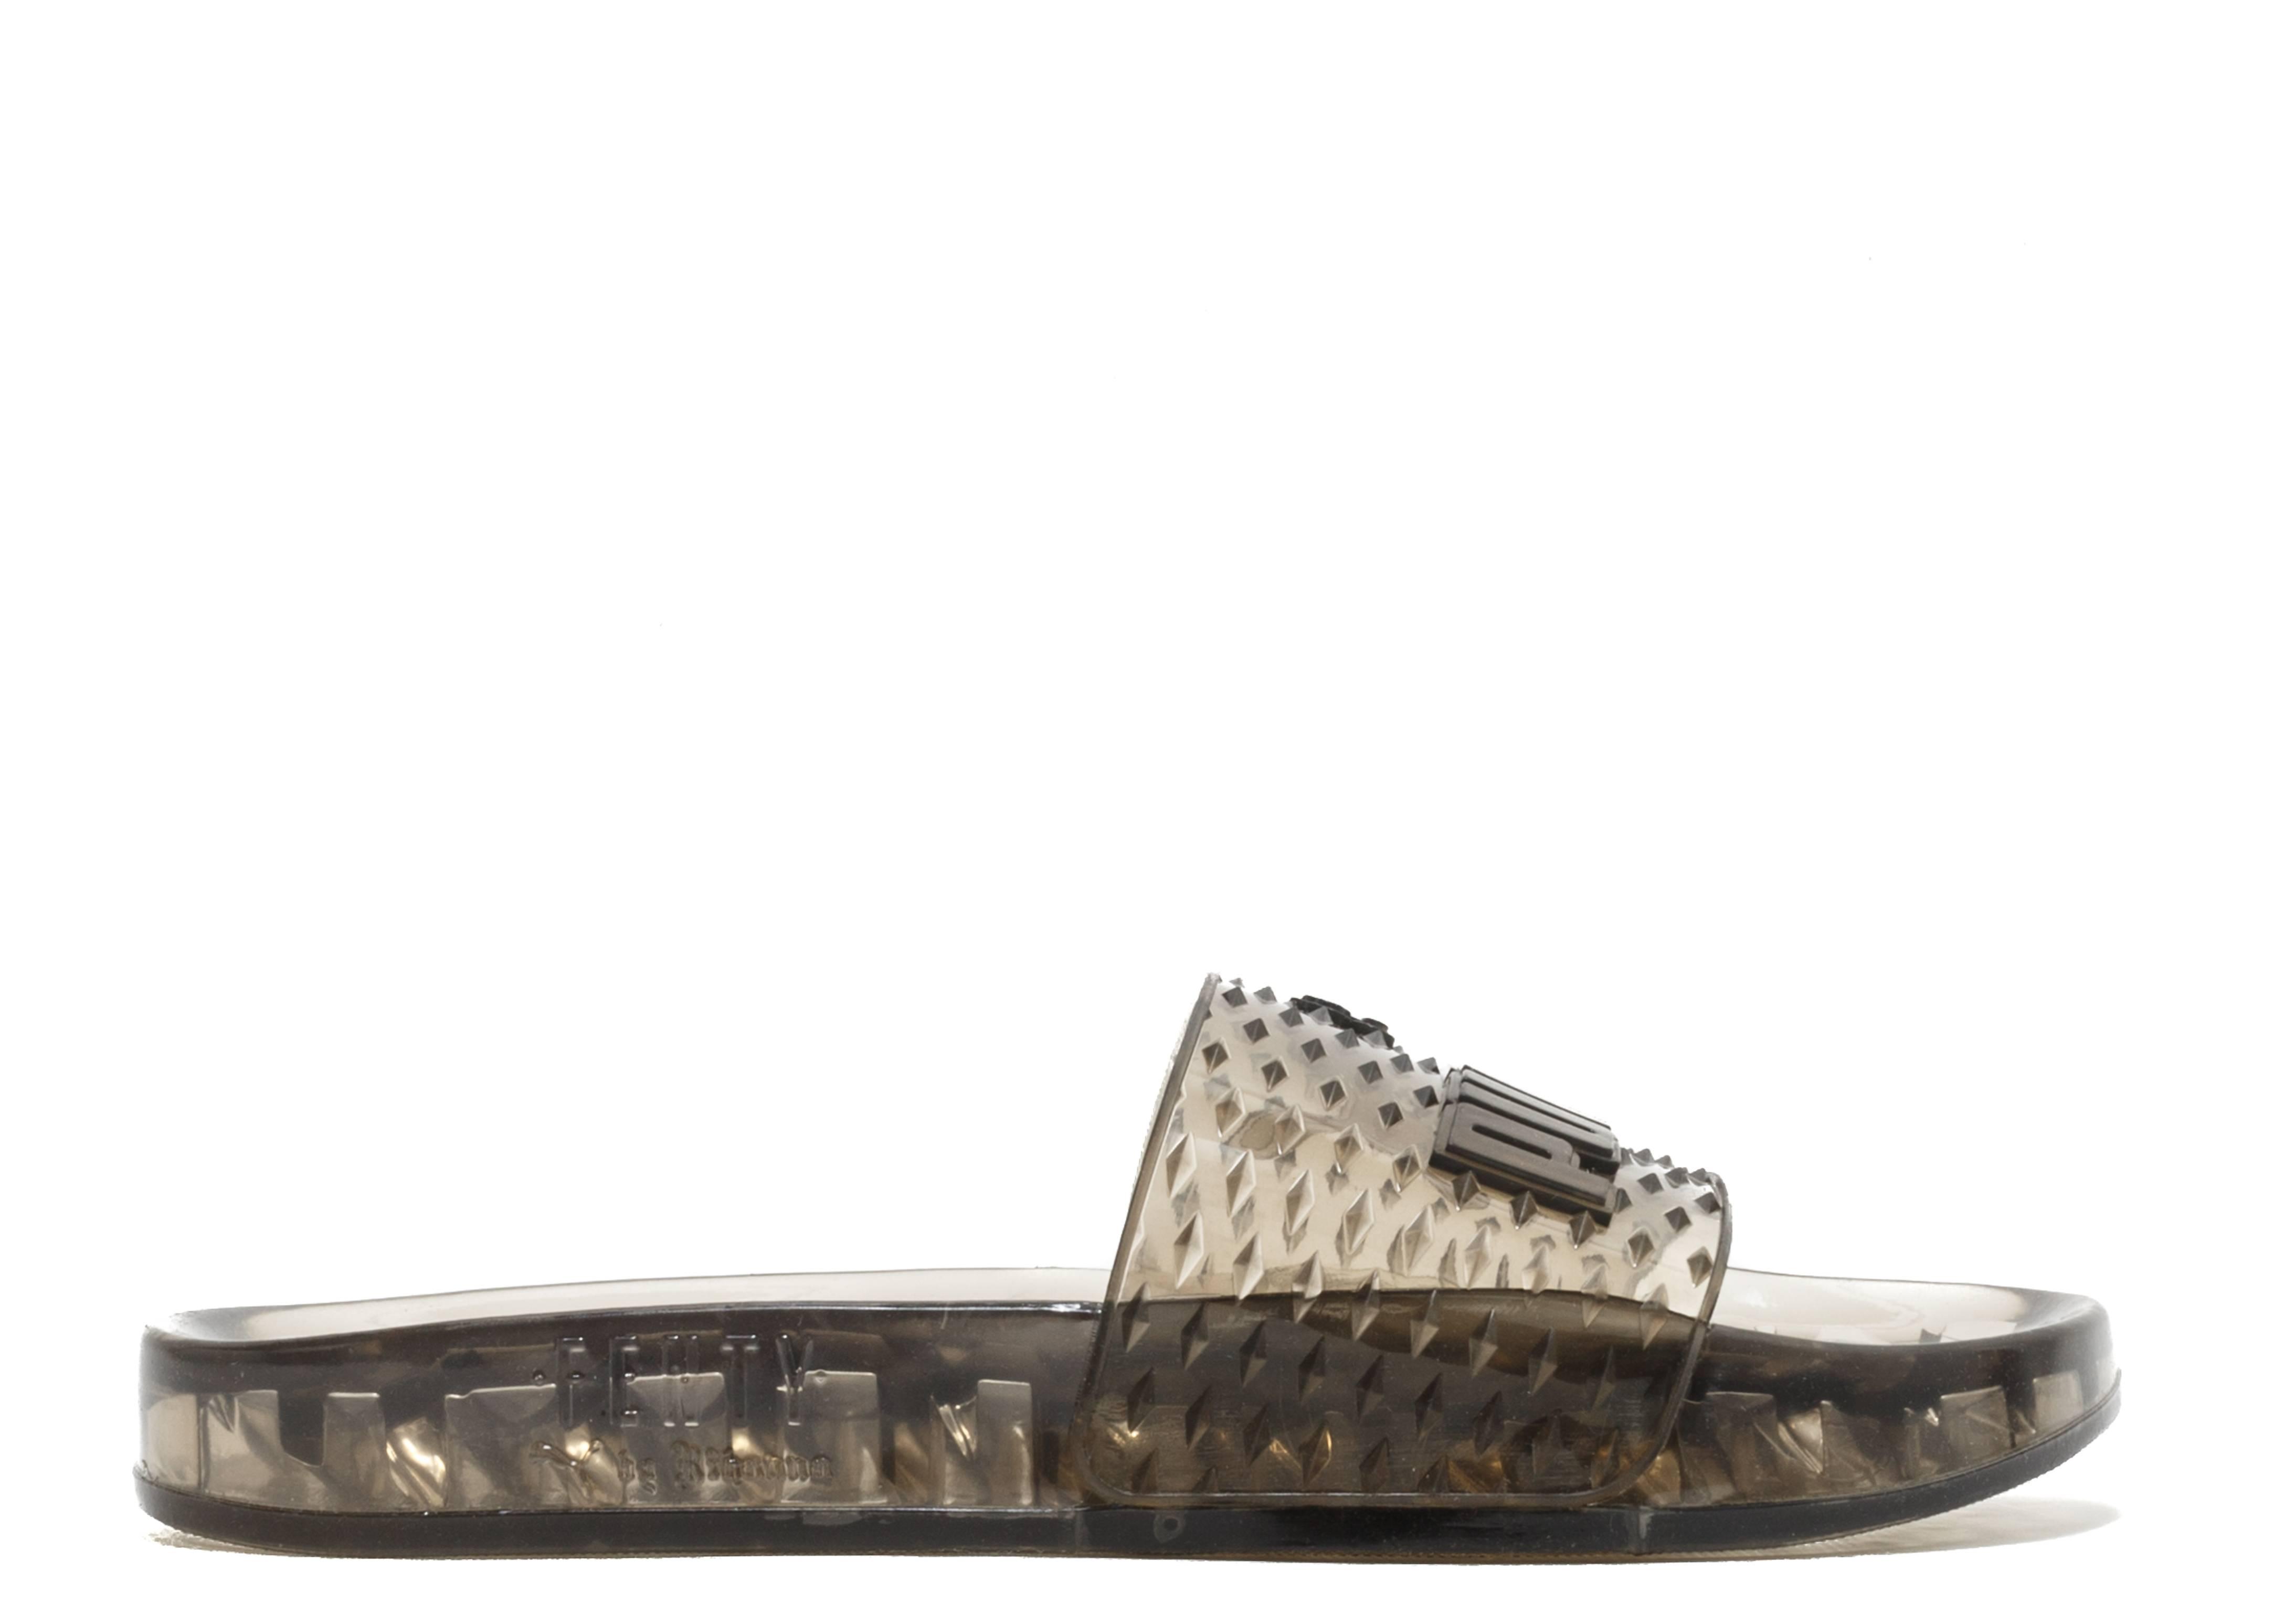 Puma Sneakers Rihanna Fenty, Creepers, Slides | Flight Club